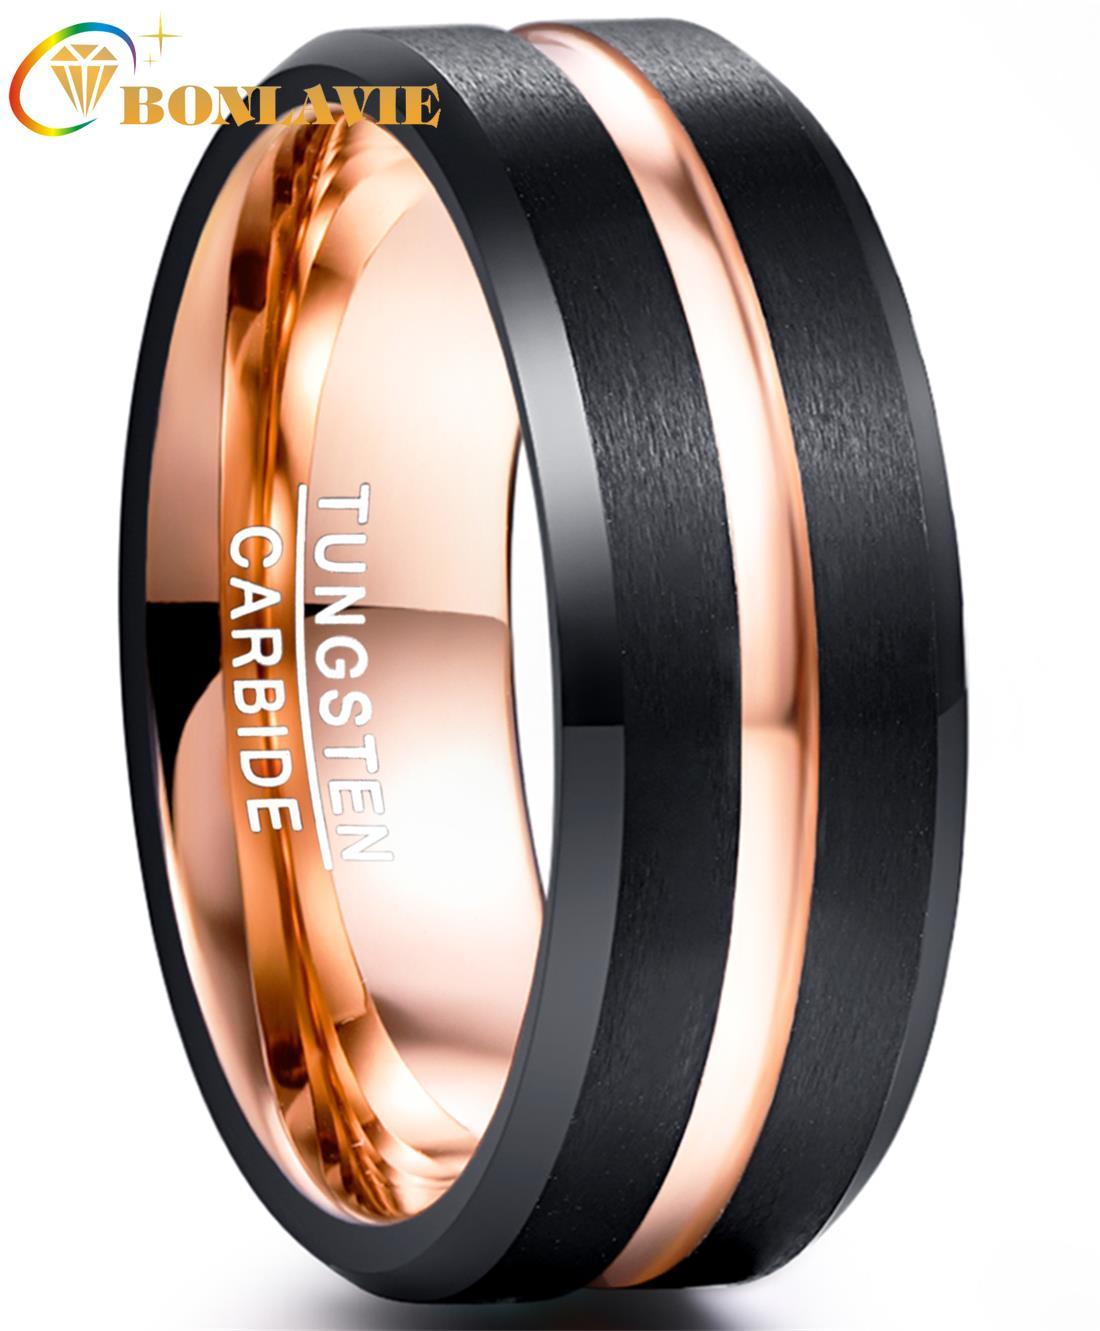 BONLAVIE anillo de hombre de 8MM de ancho carburo de tungsteno negro electroplateado oro rosa superficie mate con anillo de acero de tungsteno de ángulo ranurado